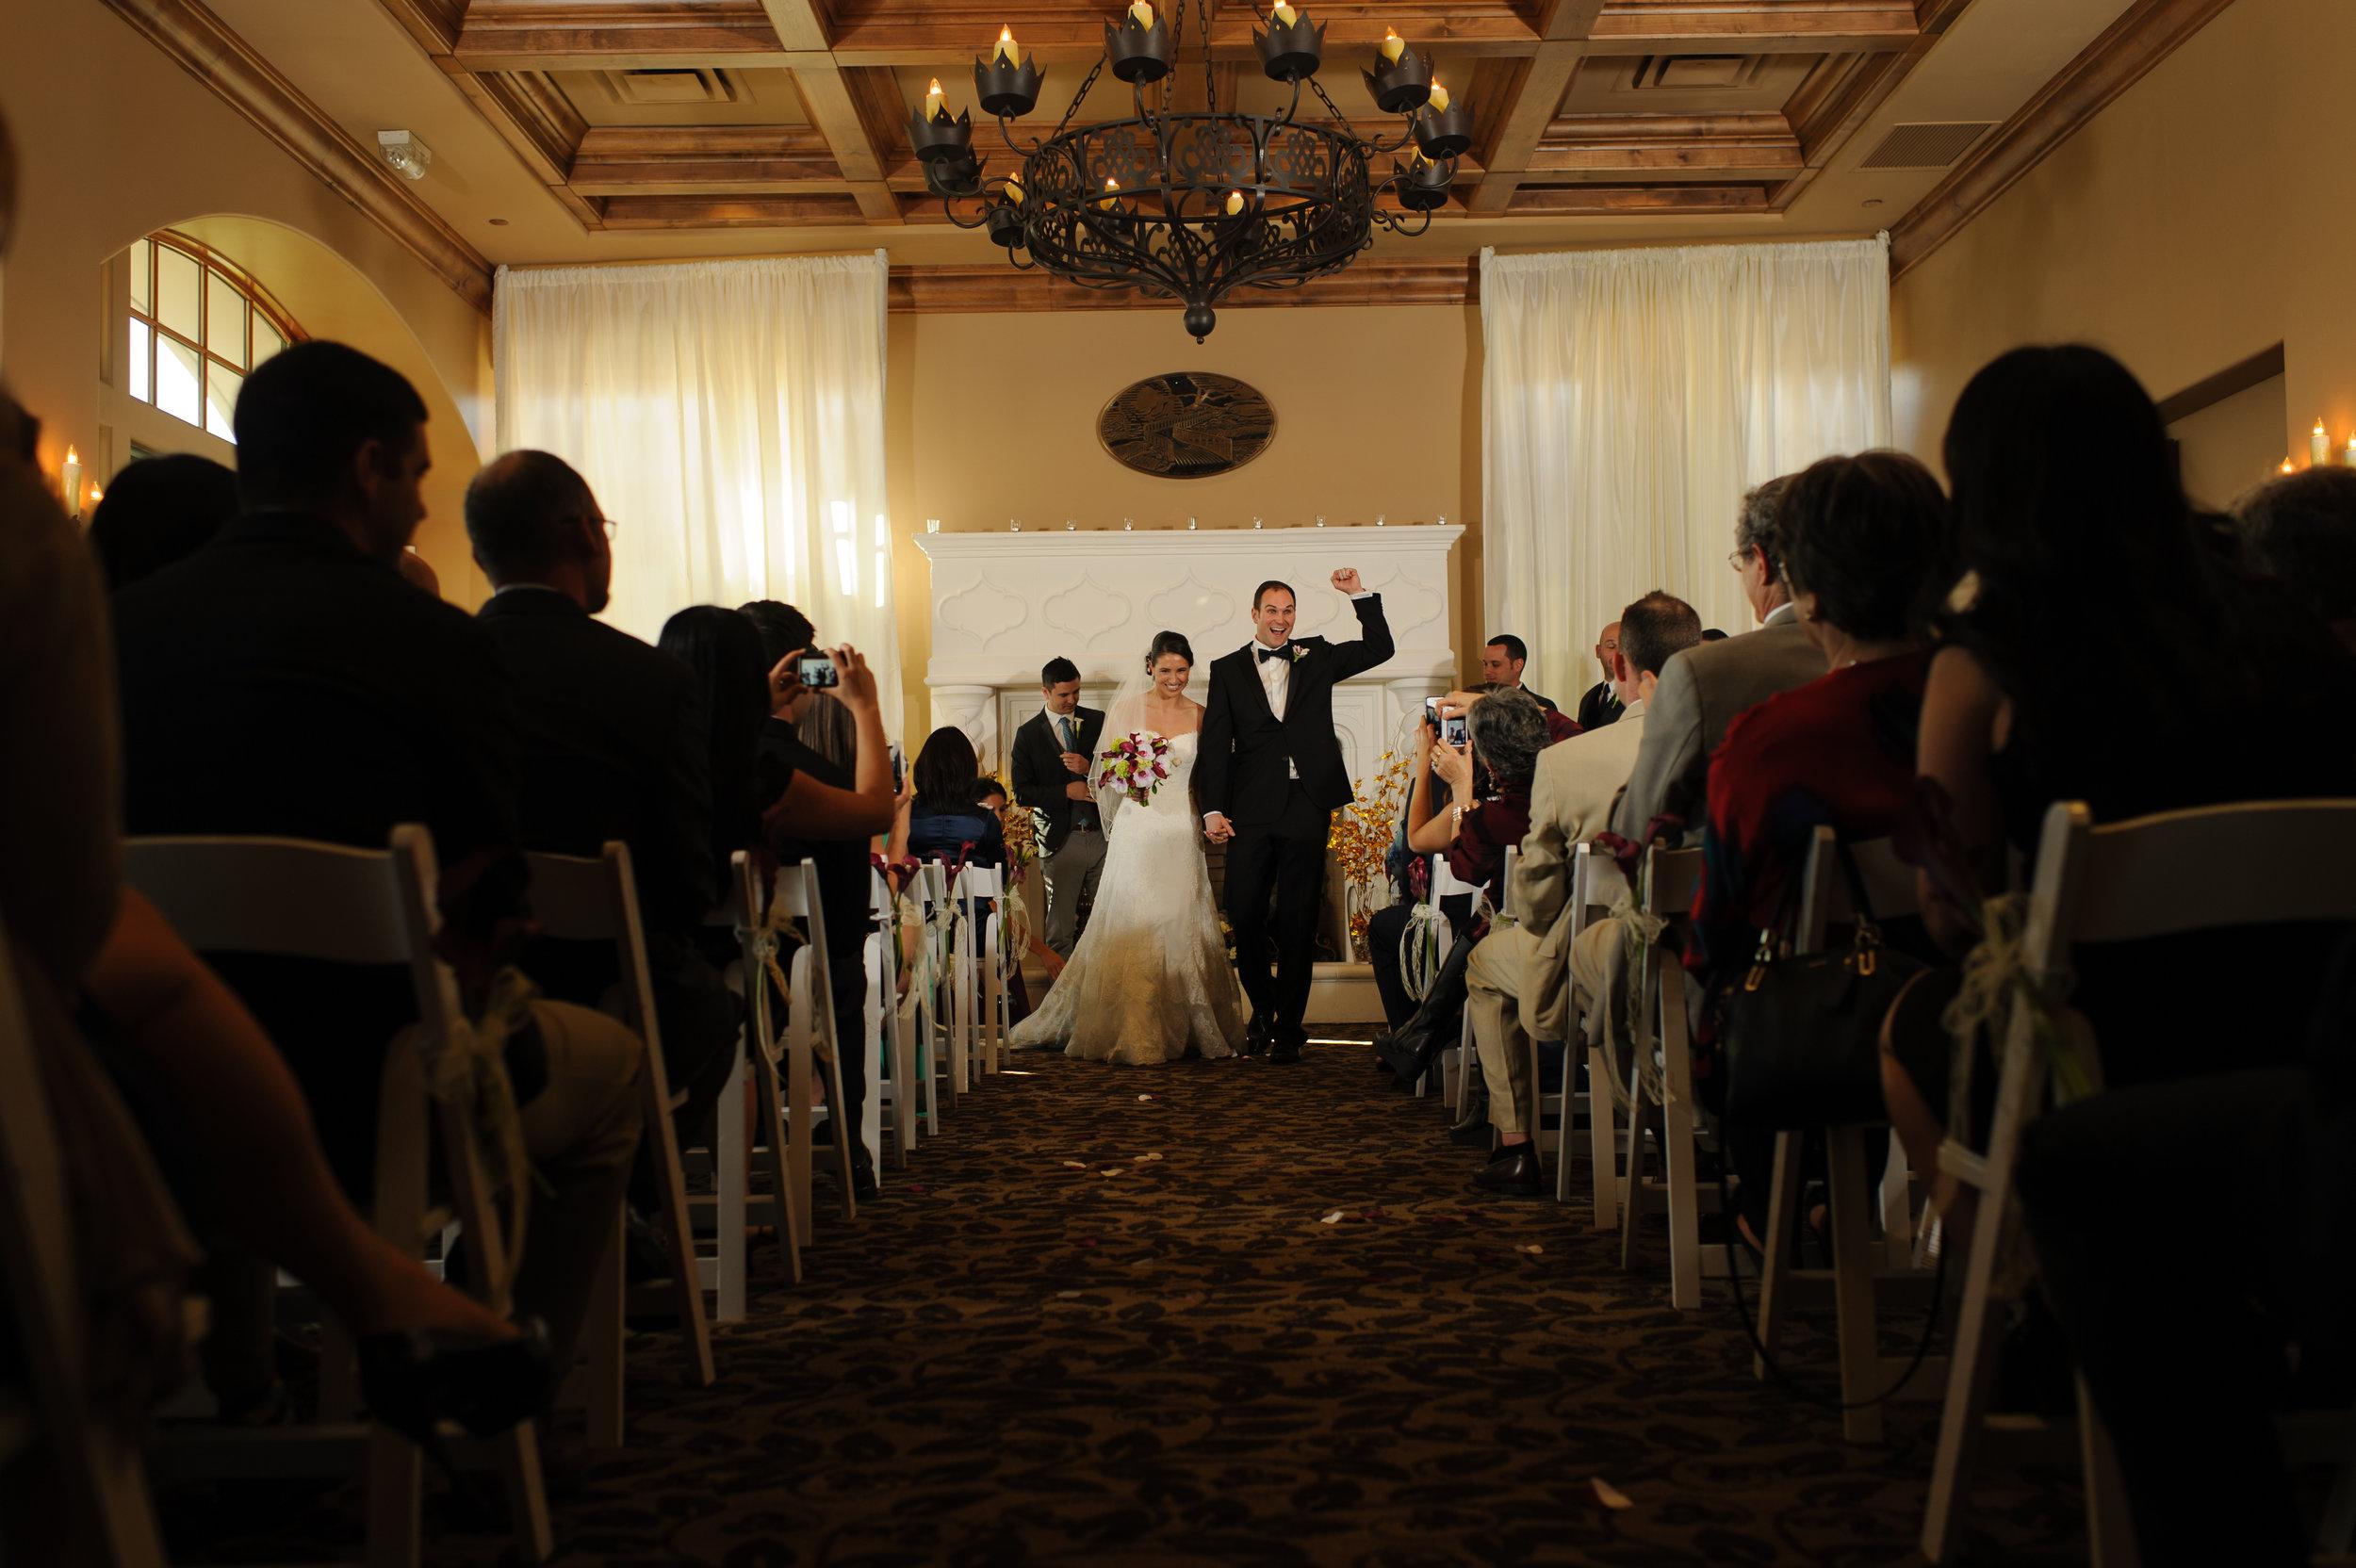 lindsey-jake-024-the-bridges-golf-course-san-ramon-wedding-photographer-katherine-nicole-photography.JPG